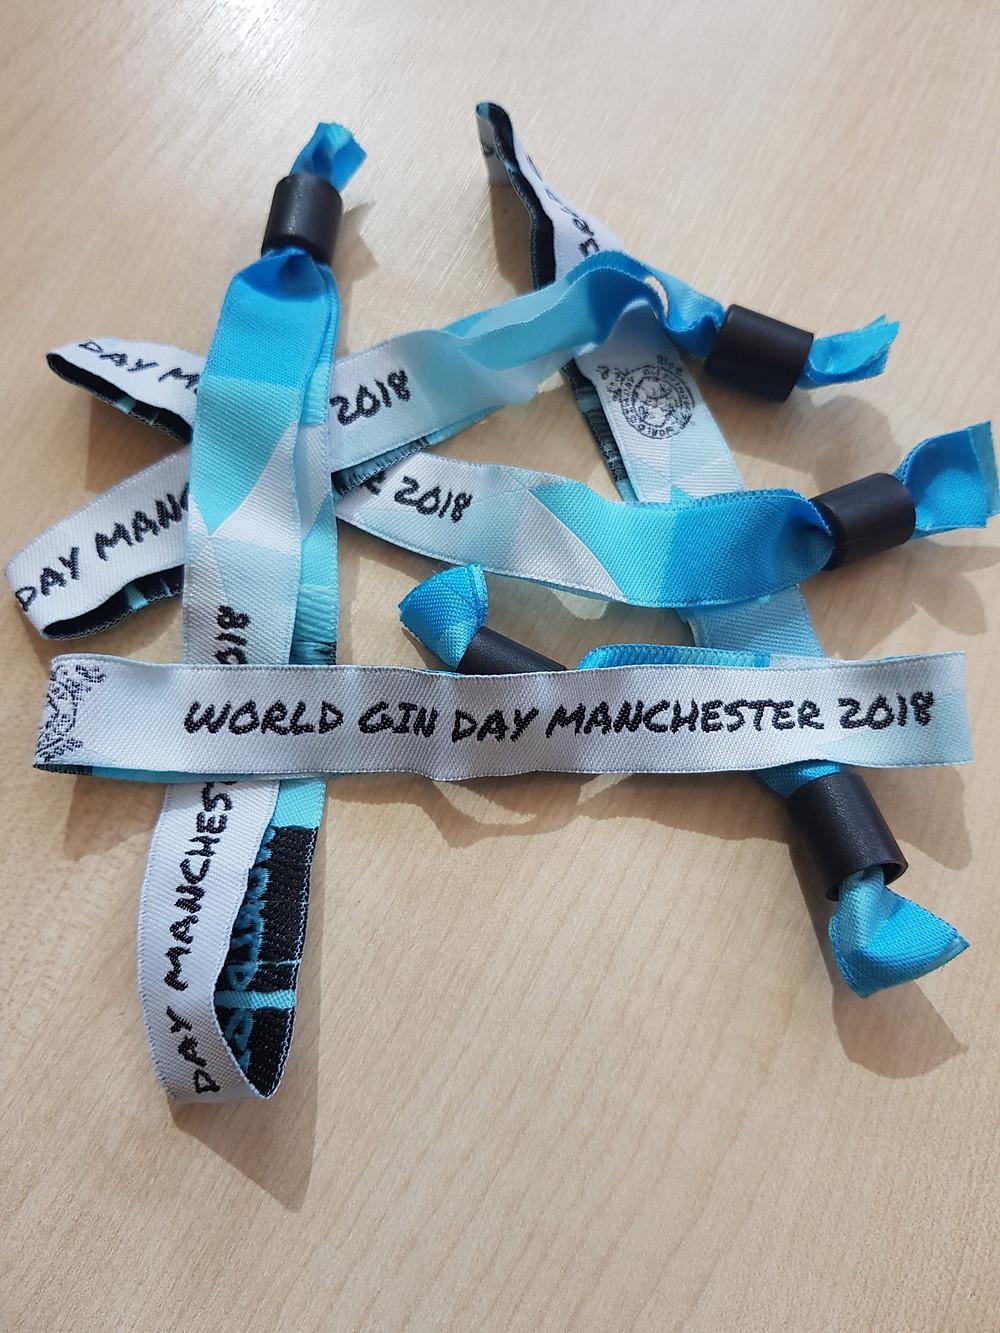 World Gin Day Manchester Wristbands 2018